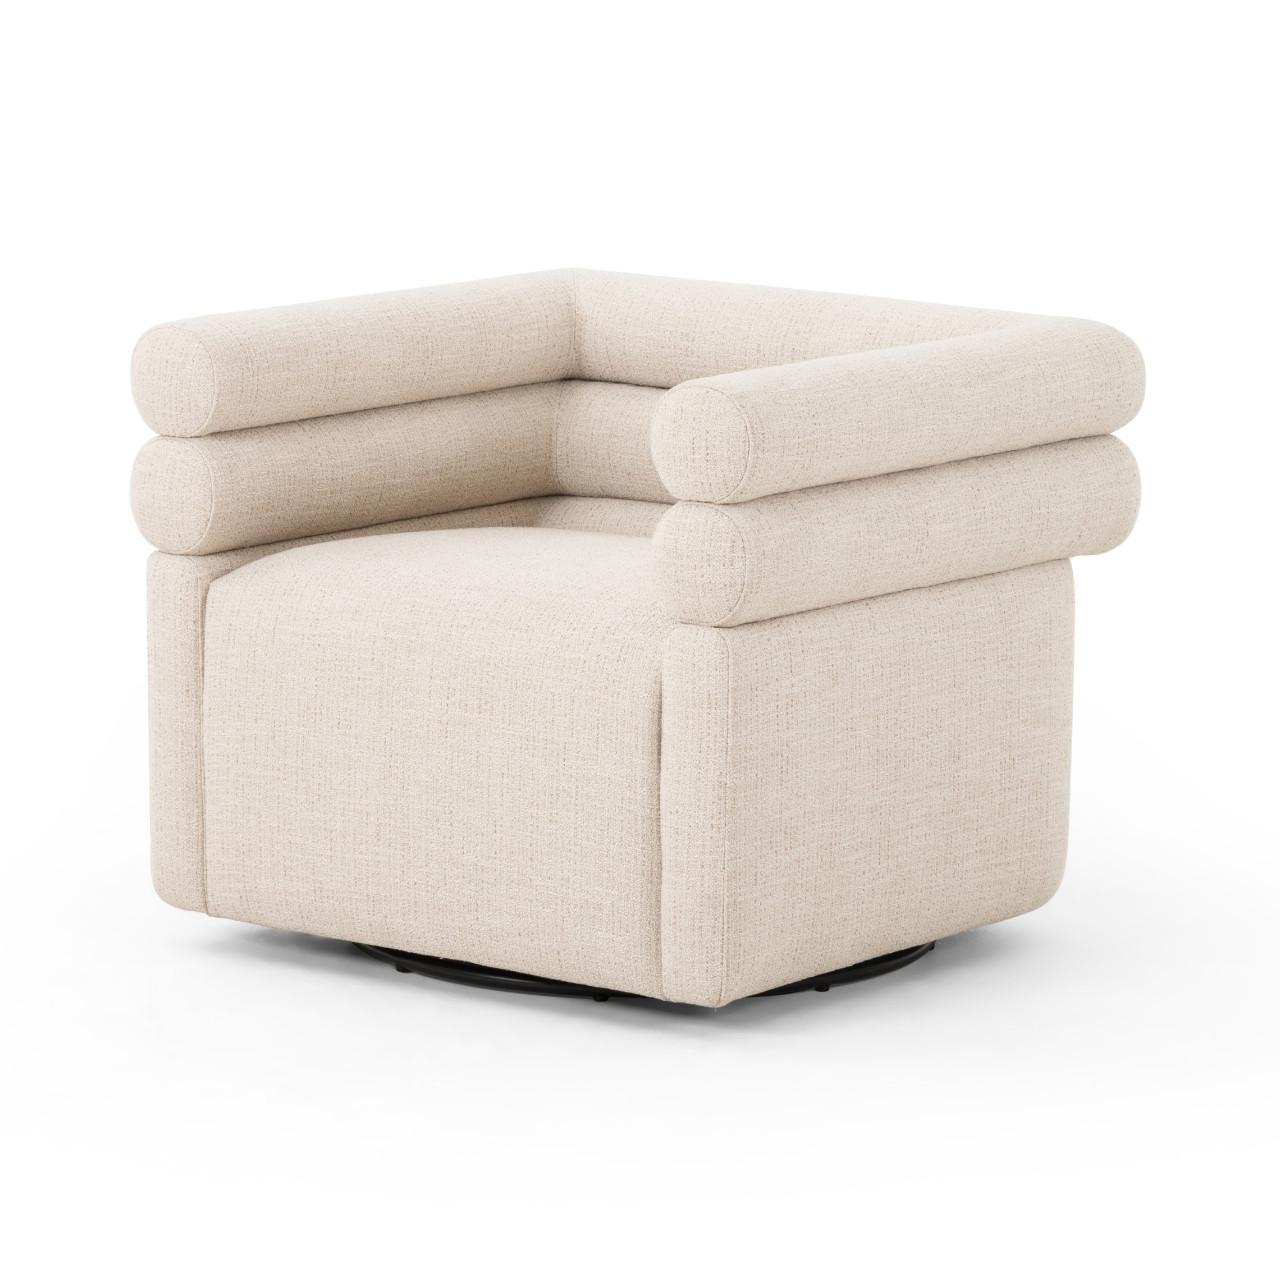 Evelia Swivel Chair - Hampton Cream